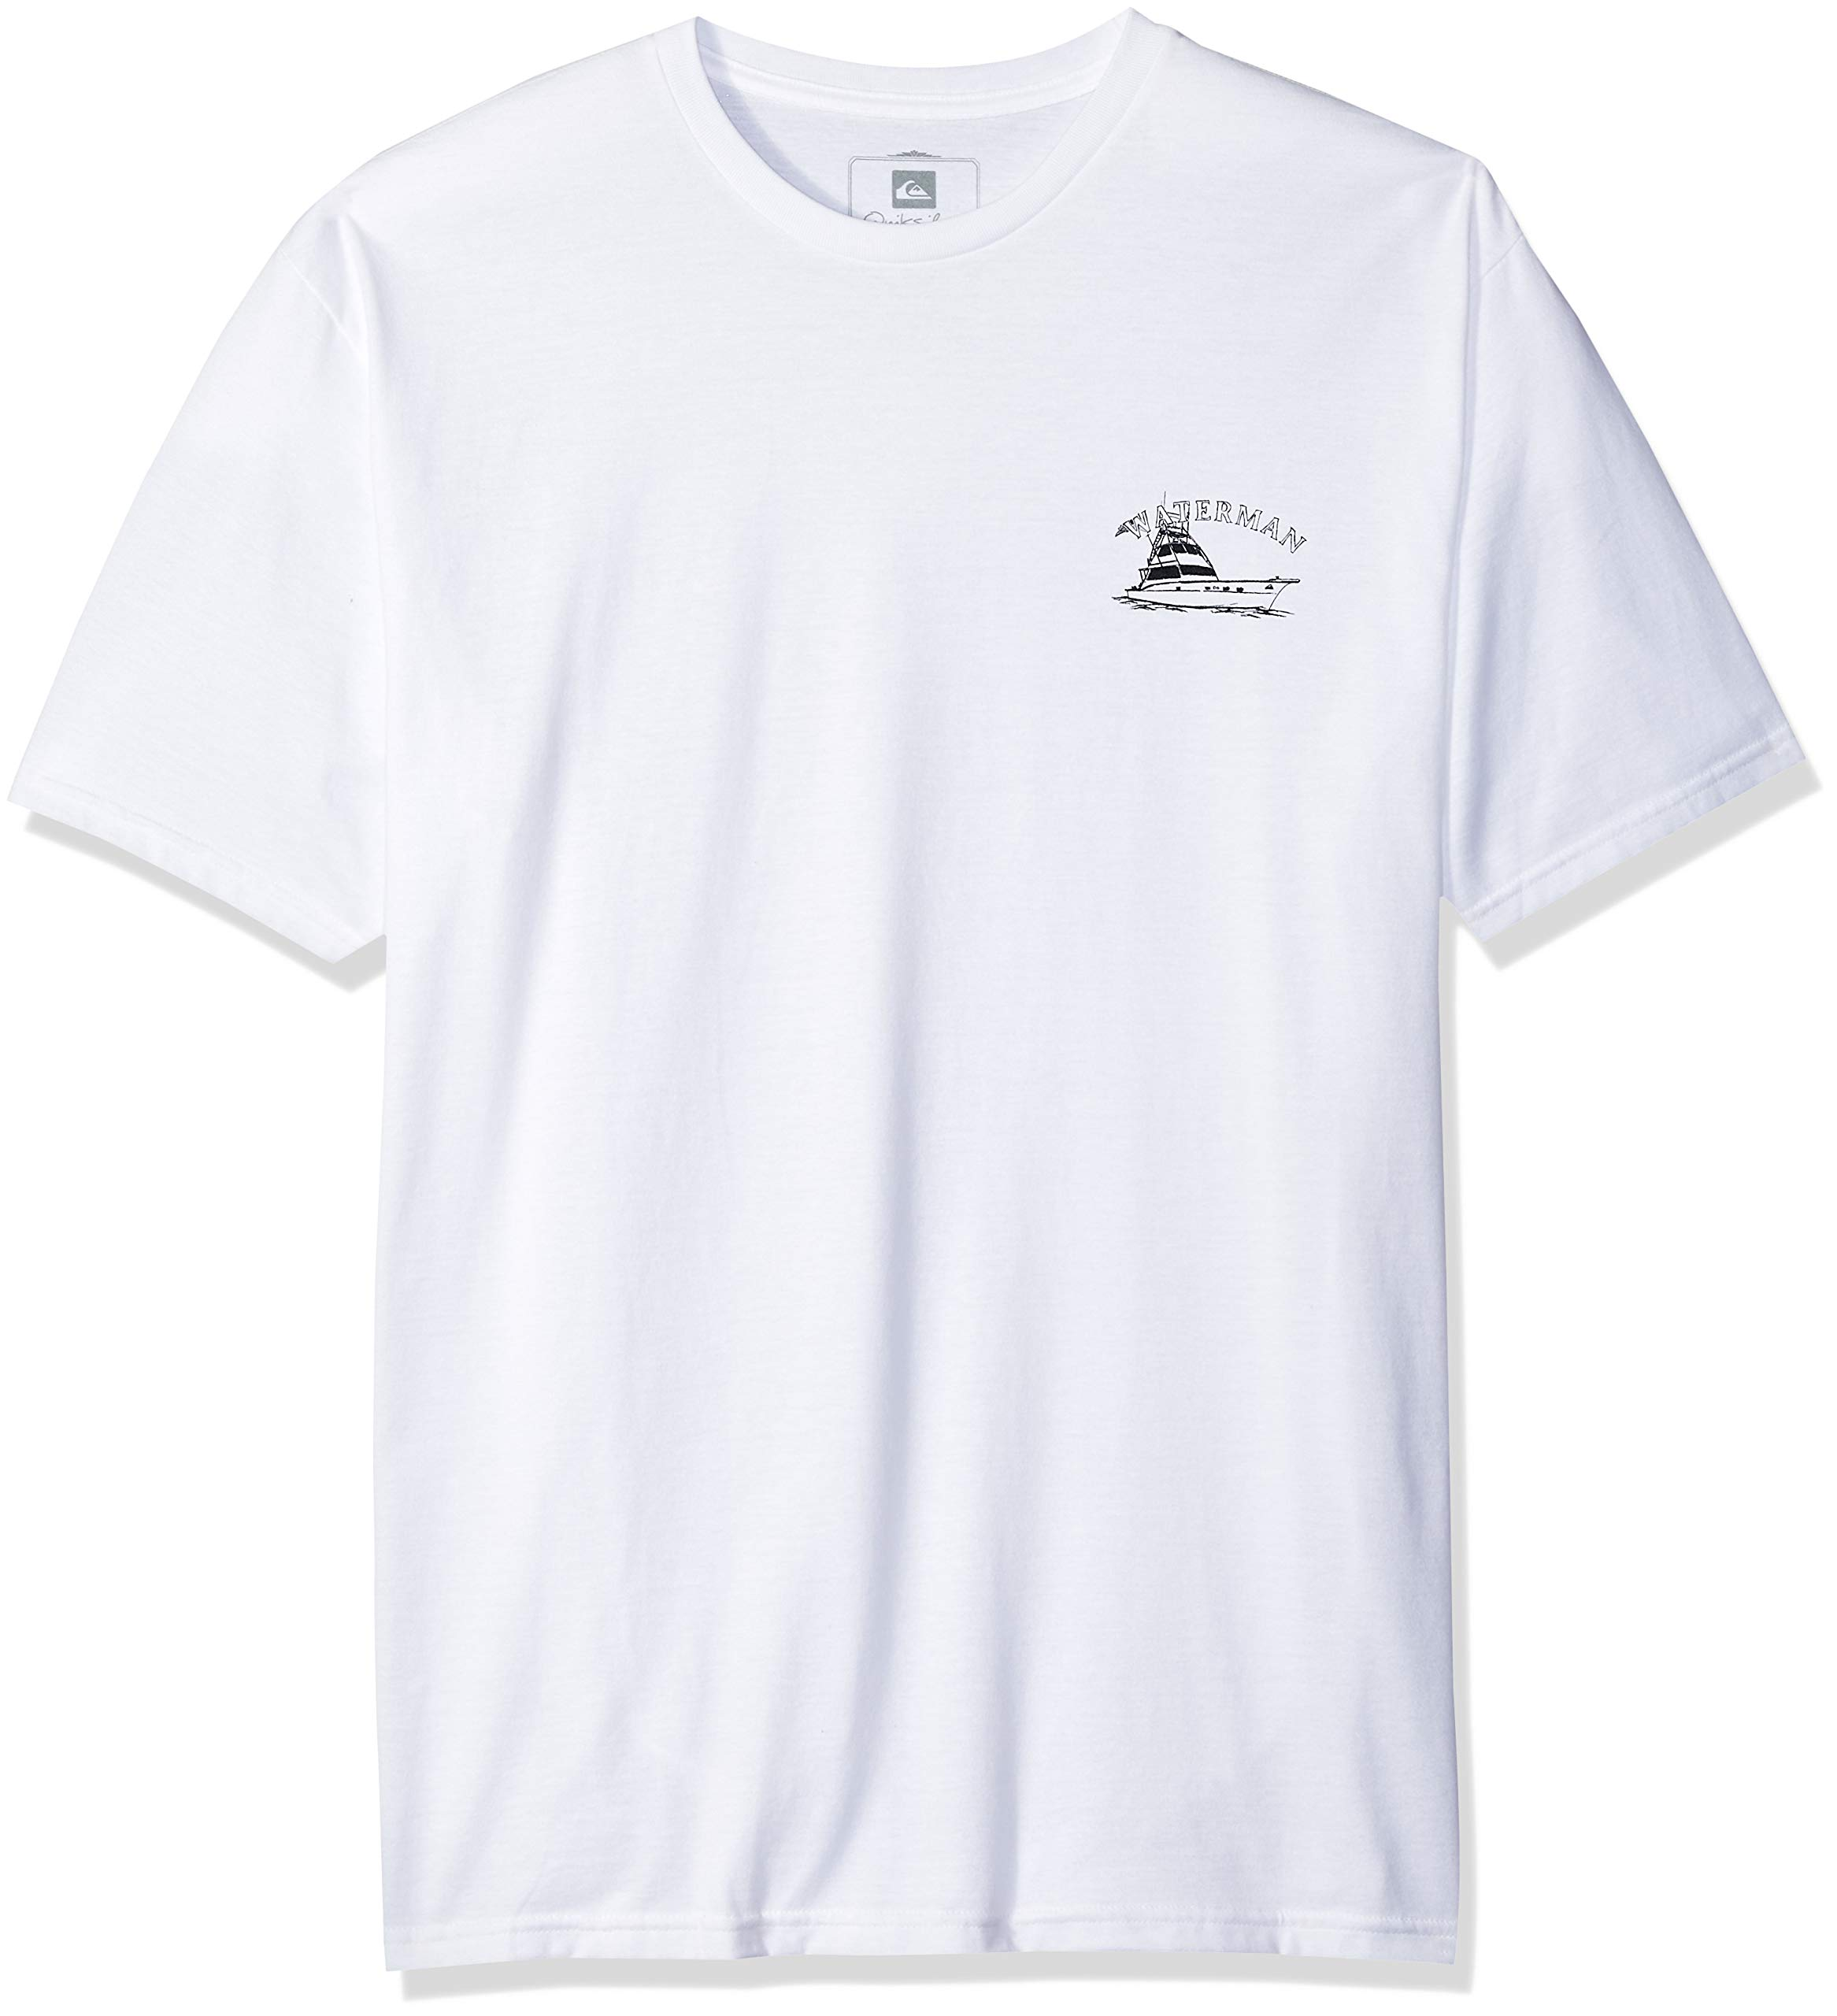 Quiksilver Men's Lauderdale TEE Shirt, White, XL